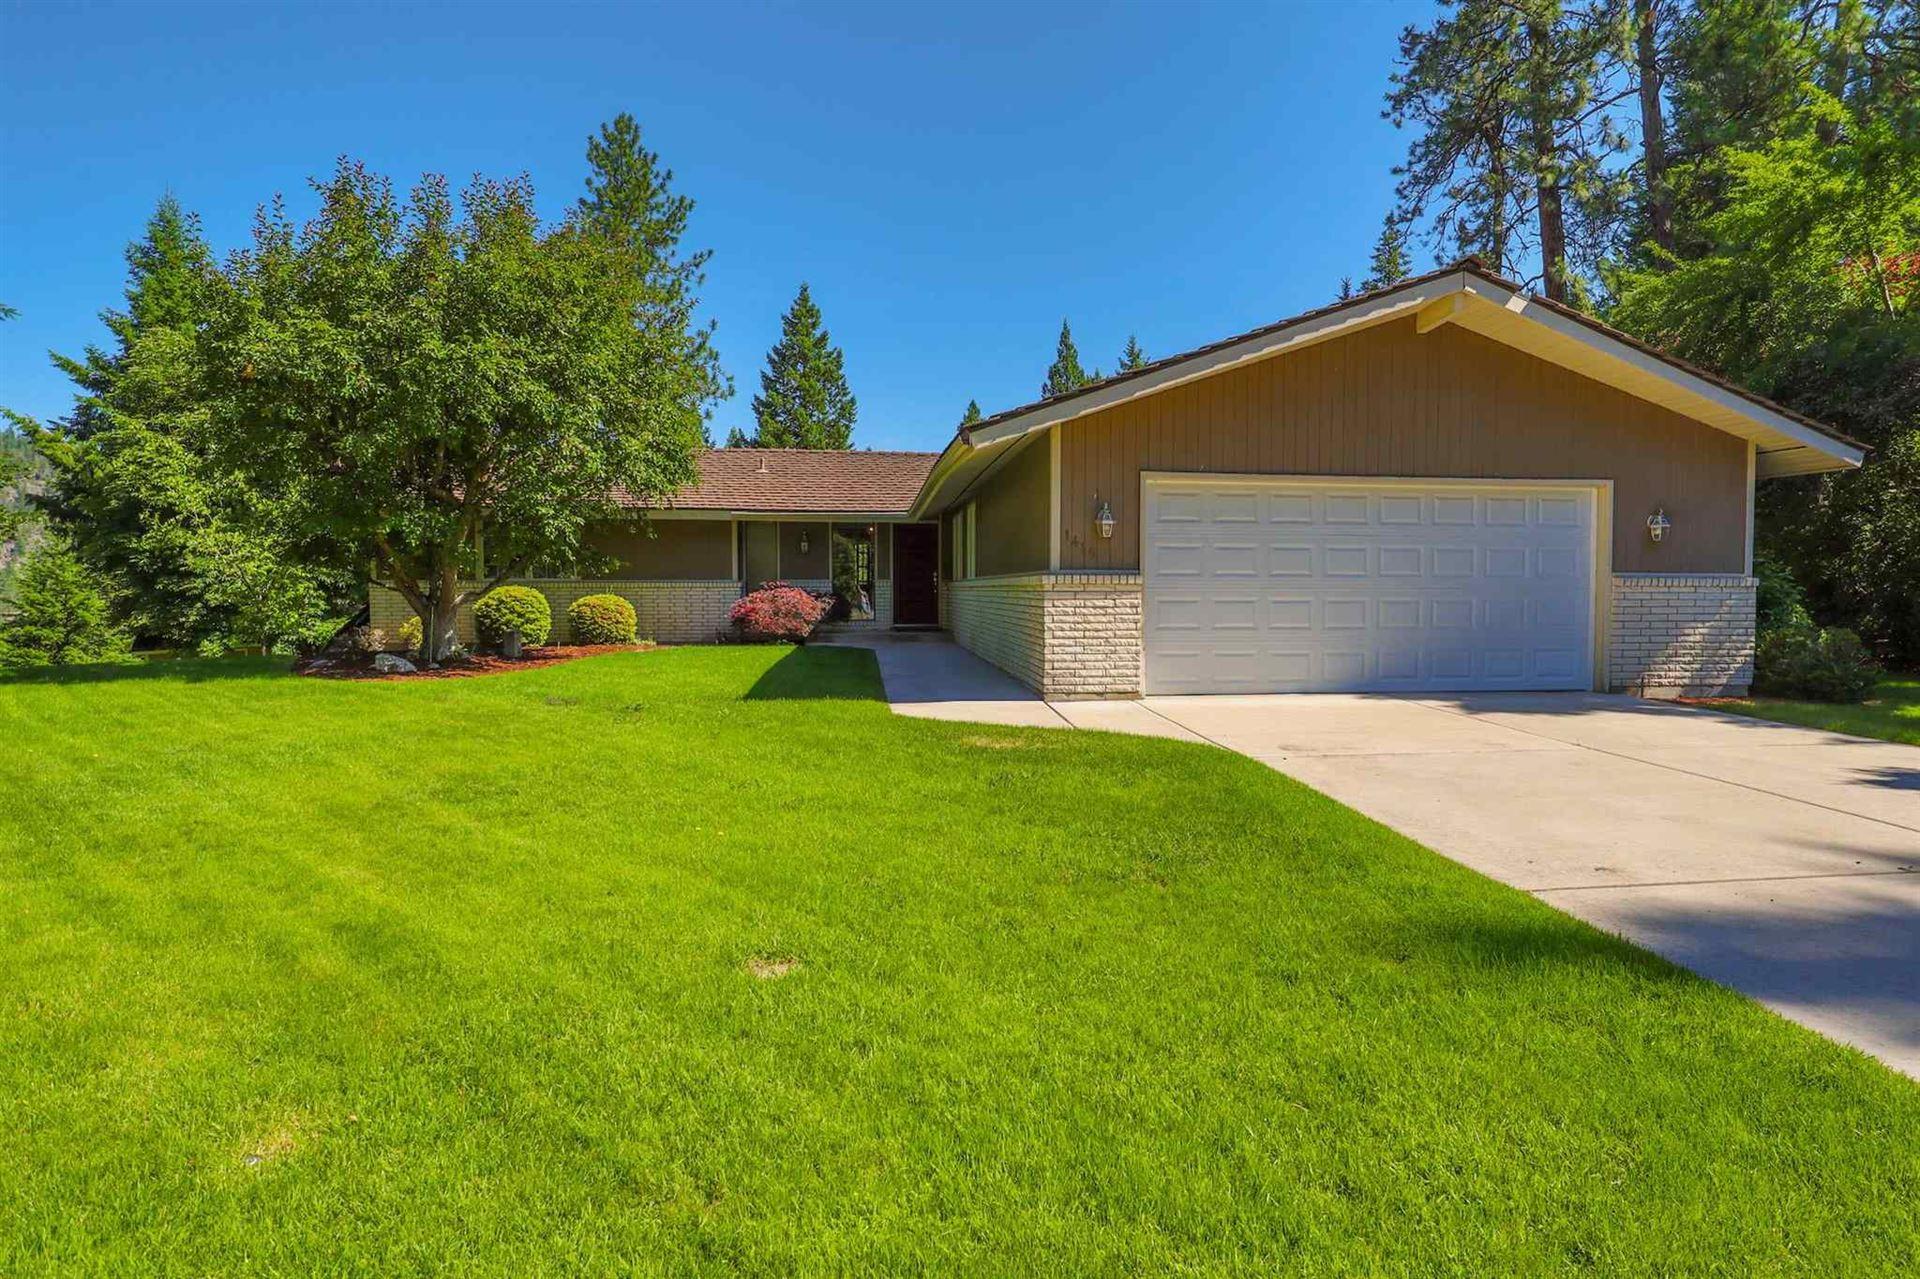 1416 W Crestwood Ct, Spokane, WA 99218 - #: 202119594